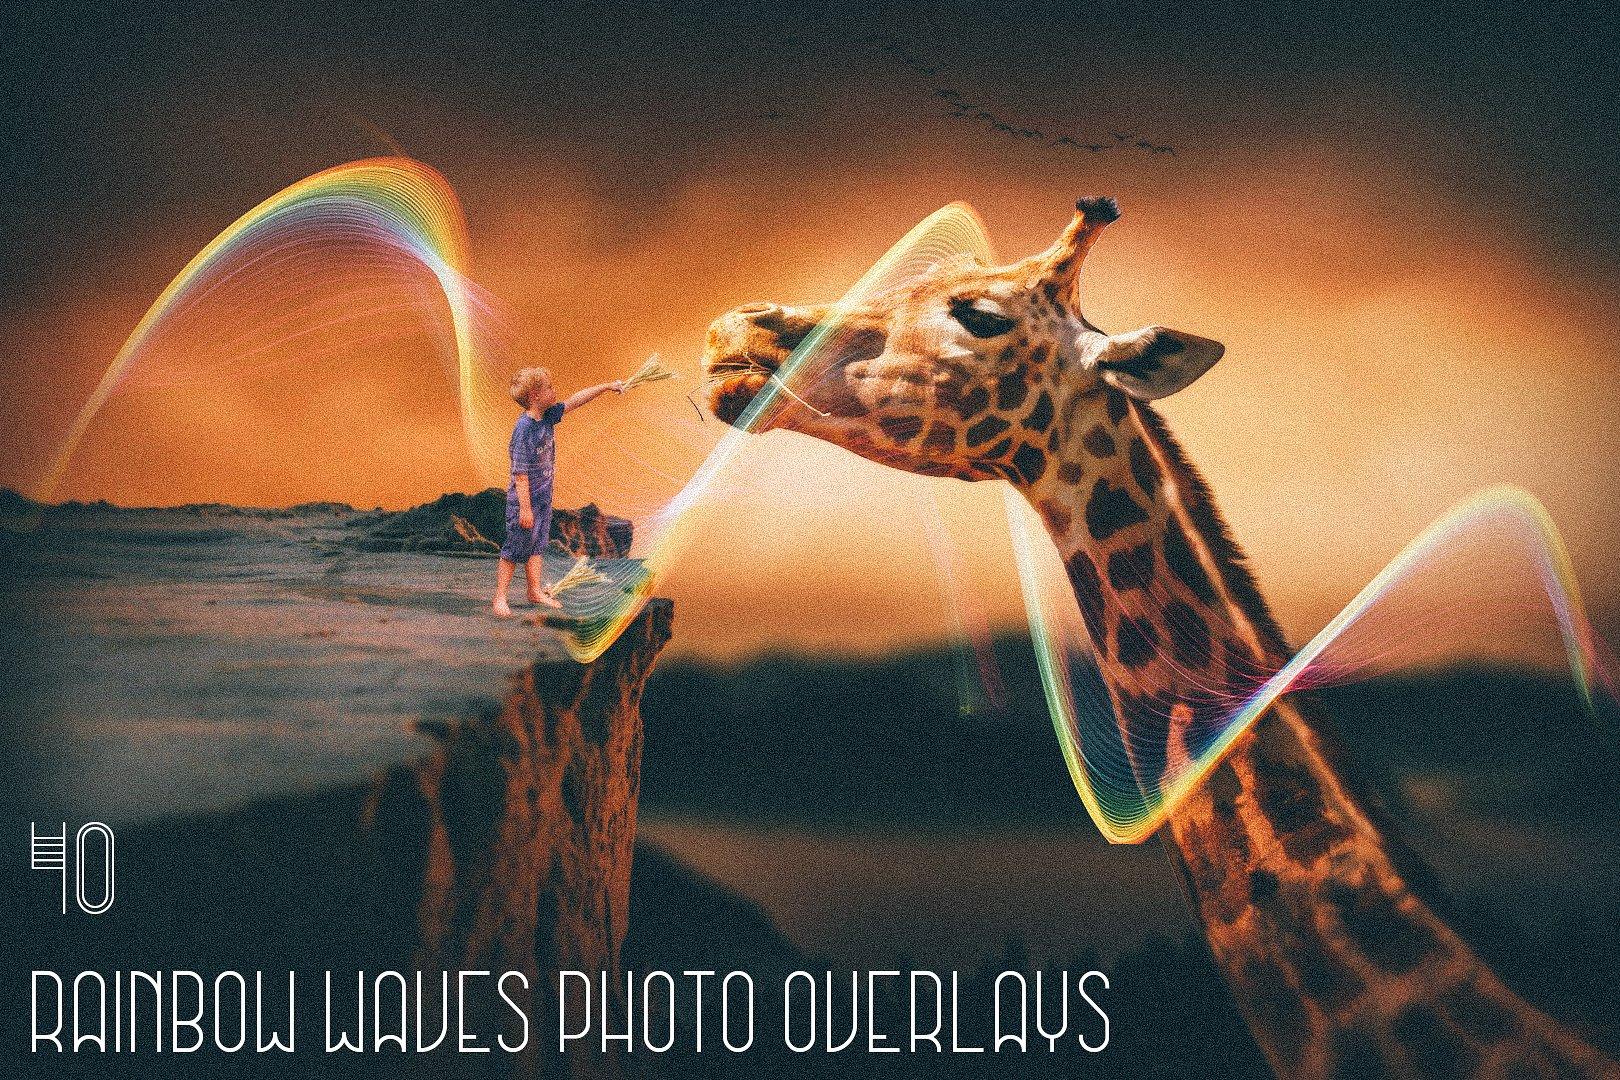 40 Rainbow Waves Photo Overlays - $9 - main image